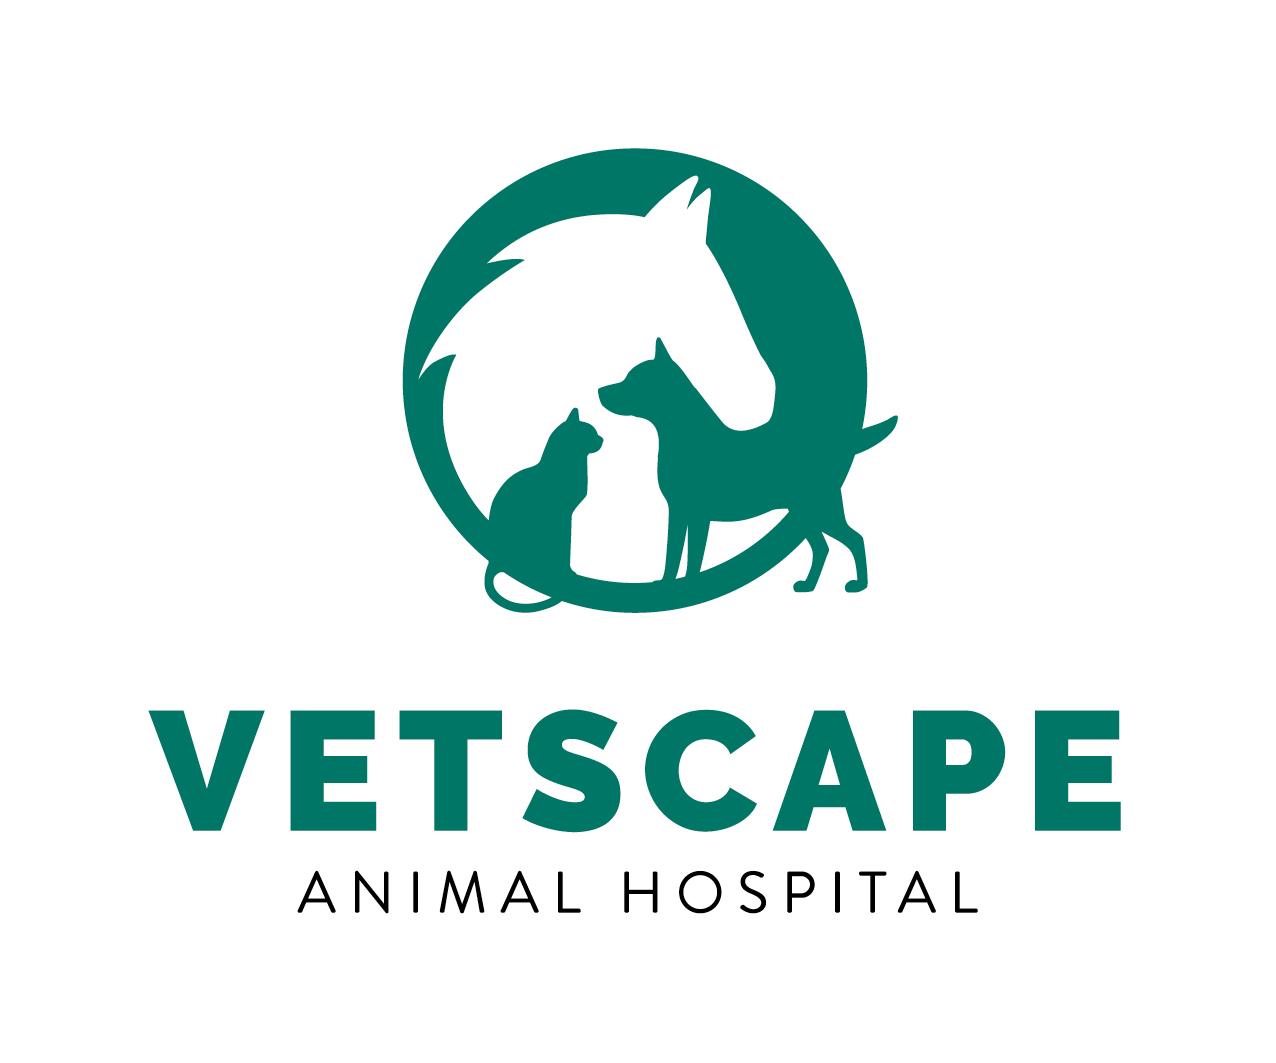 Vetscape Animal Hospital logo